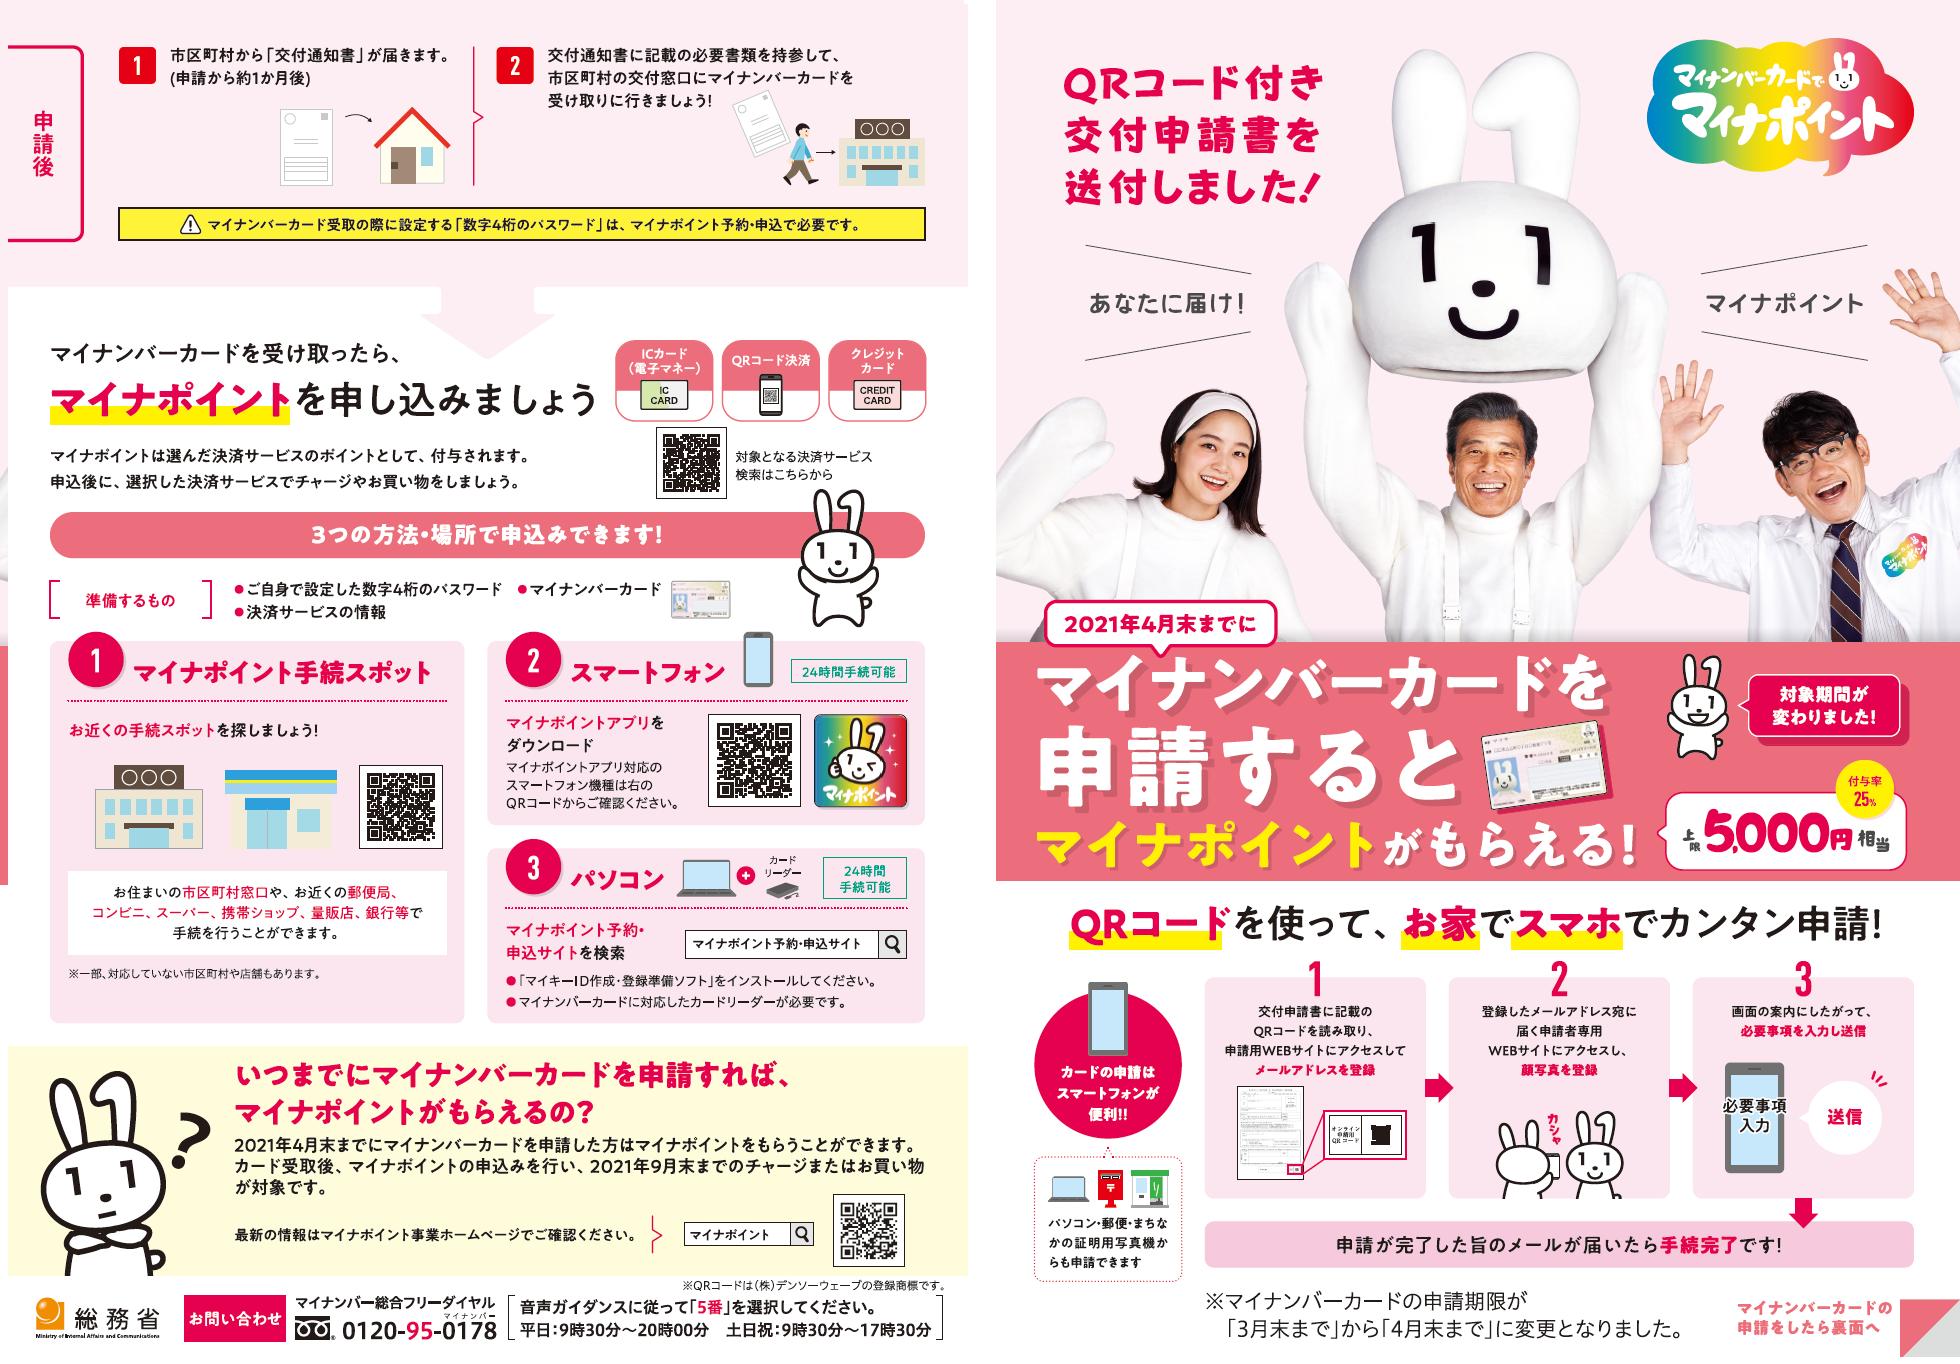 https://www.town.tadami.lg.jp/information/2021/04/05/mainapanhu.png